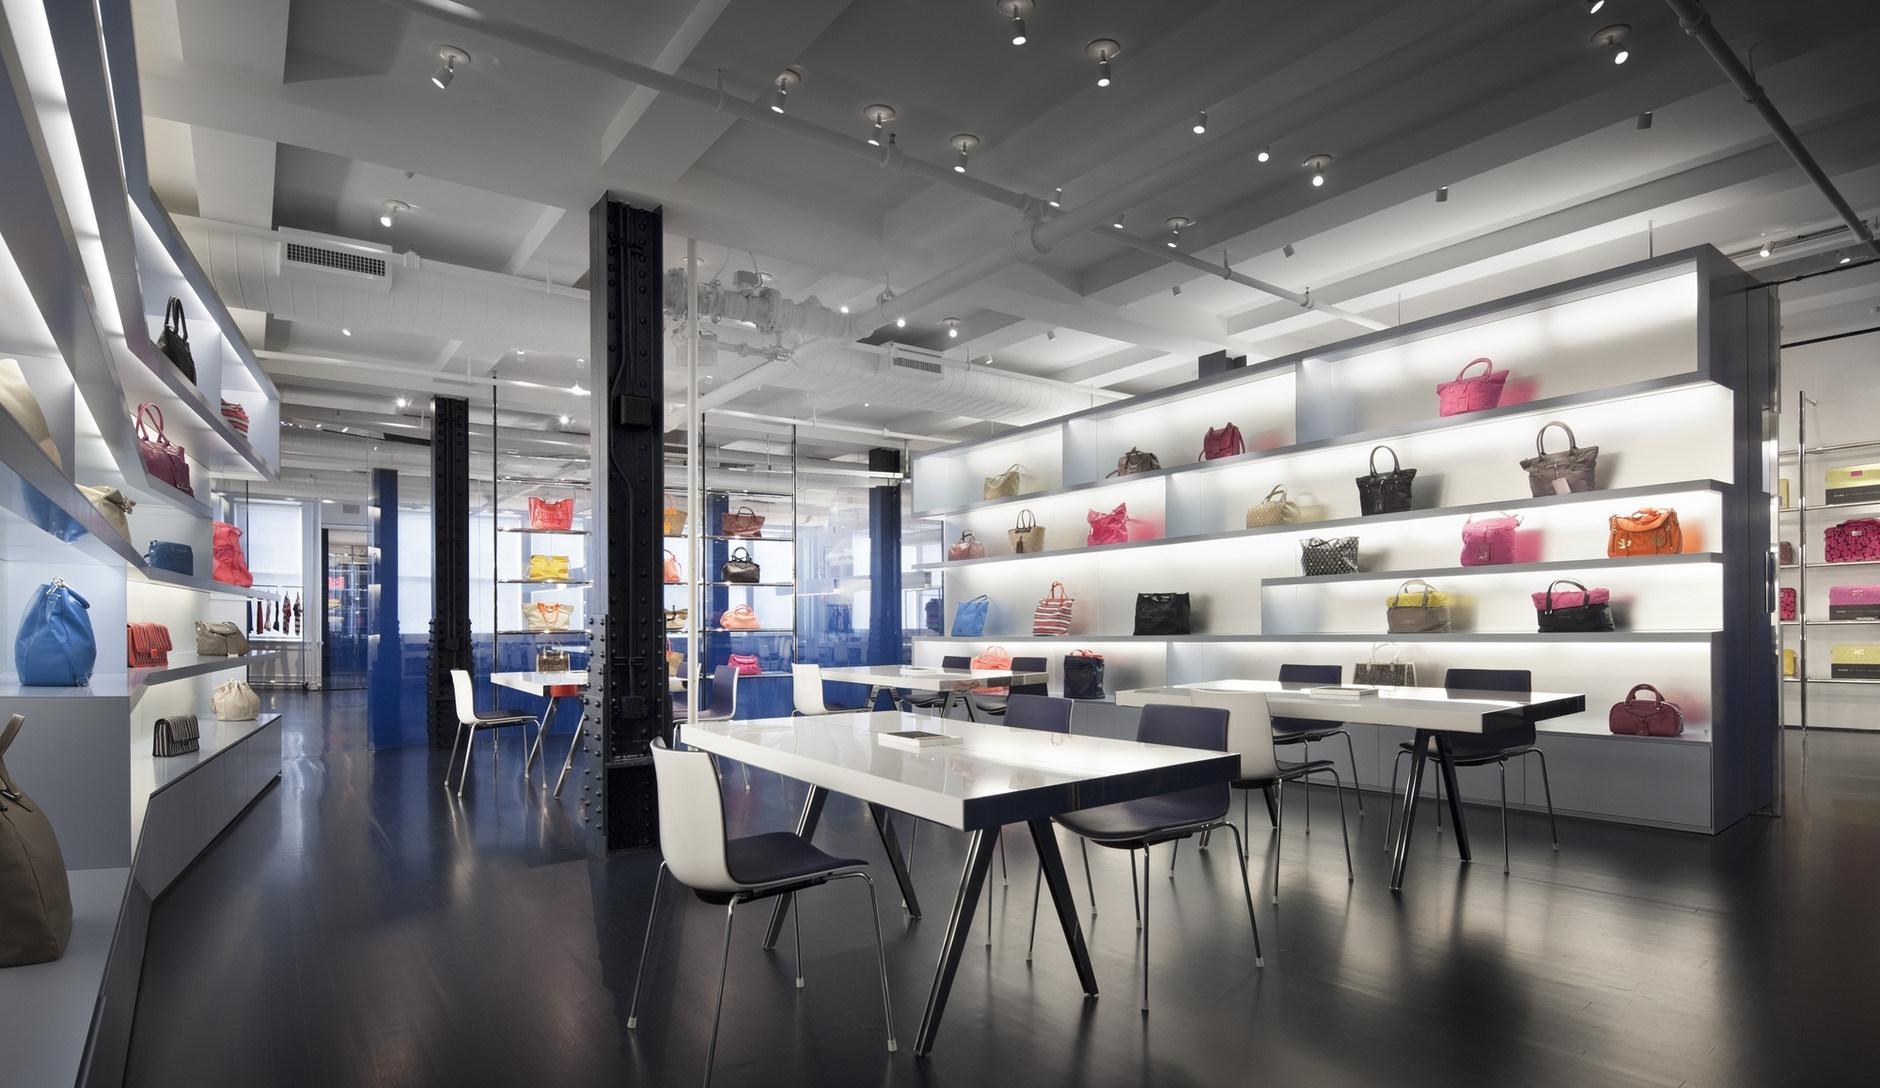 Http Karmatrendz Wordpress Com 2012 10 19 Marc By Marc Jacobs Showroom By Jaklitsch Gardner Architects Pc